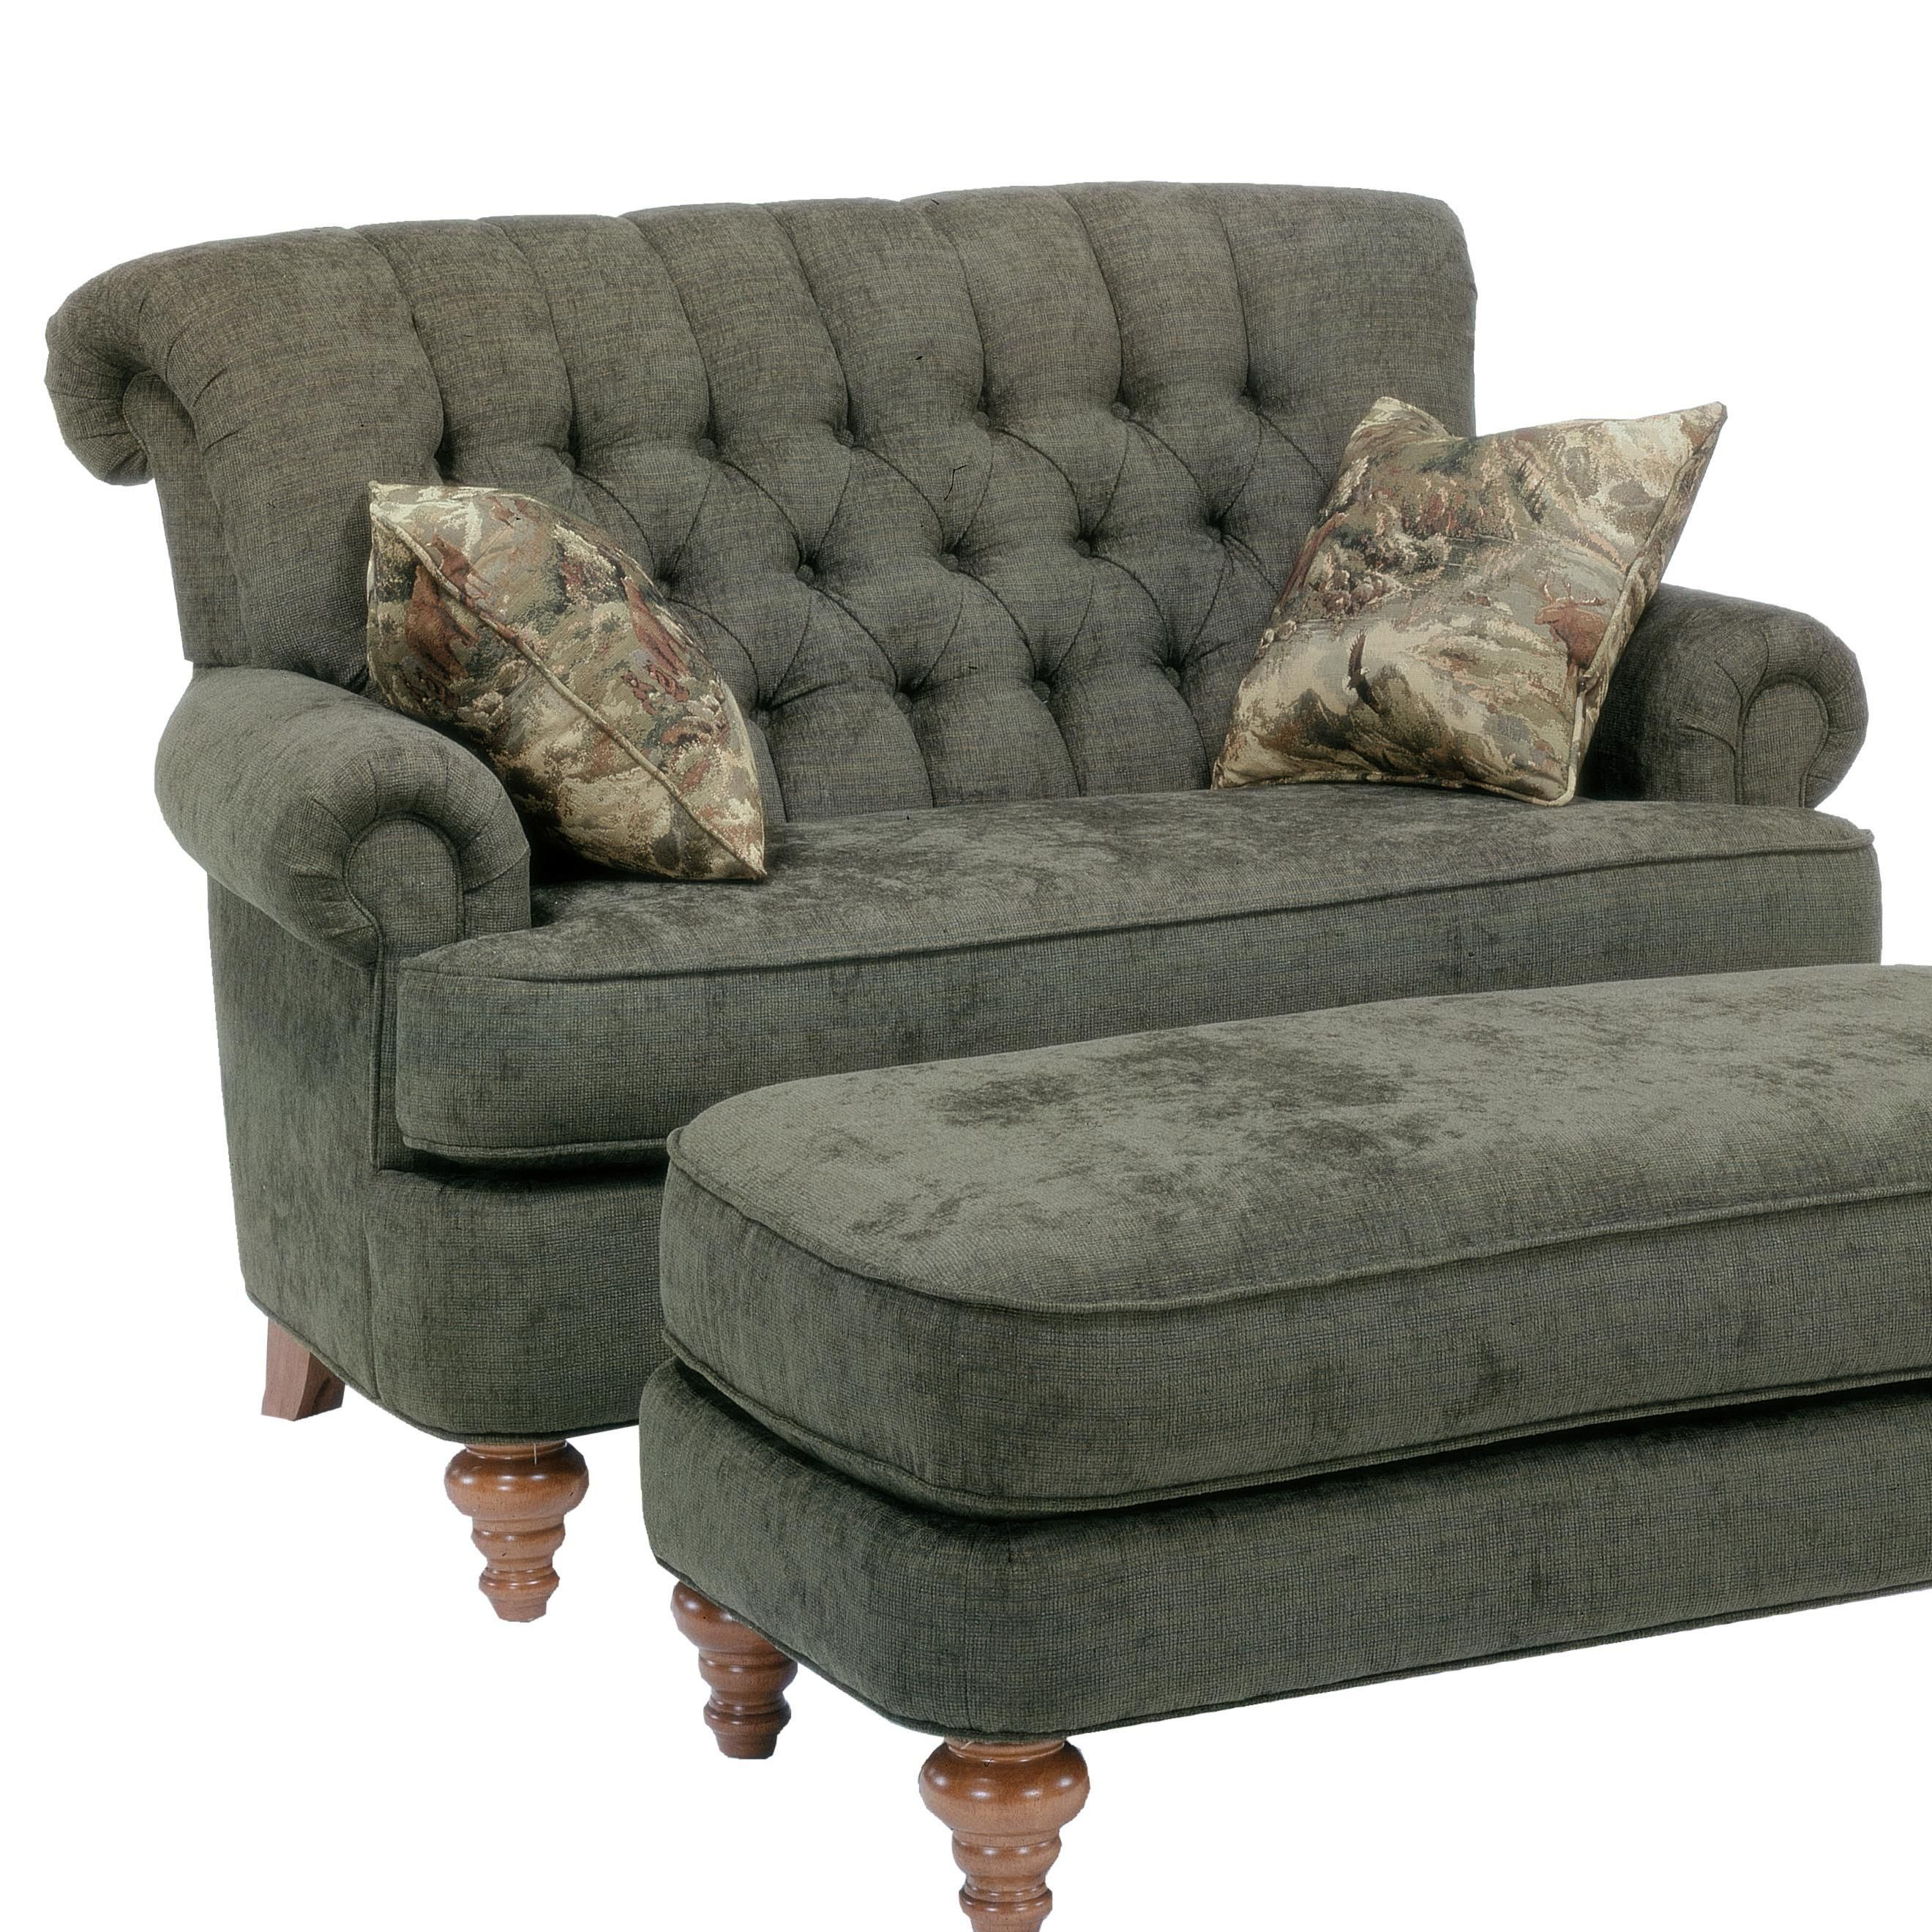 Flexsteel Sofa Vintage: South Hampton Settee By Flexsteel